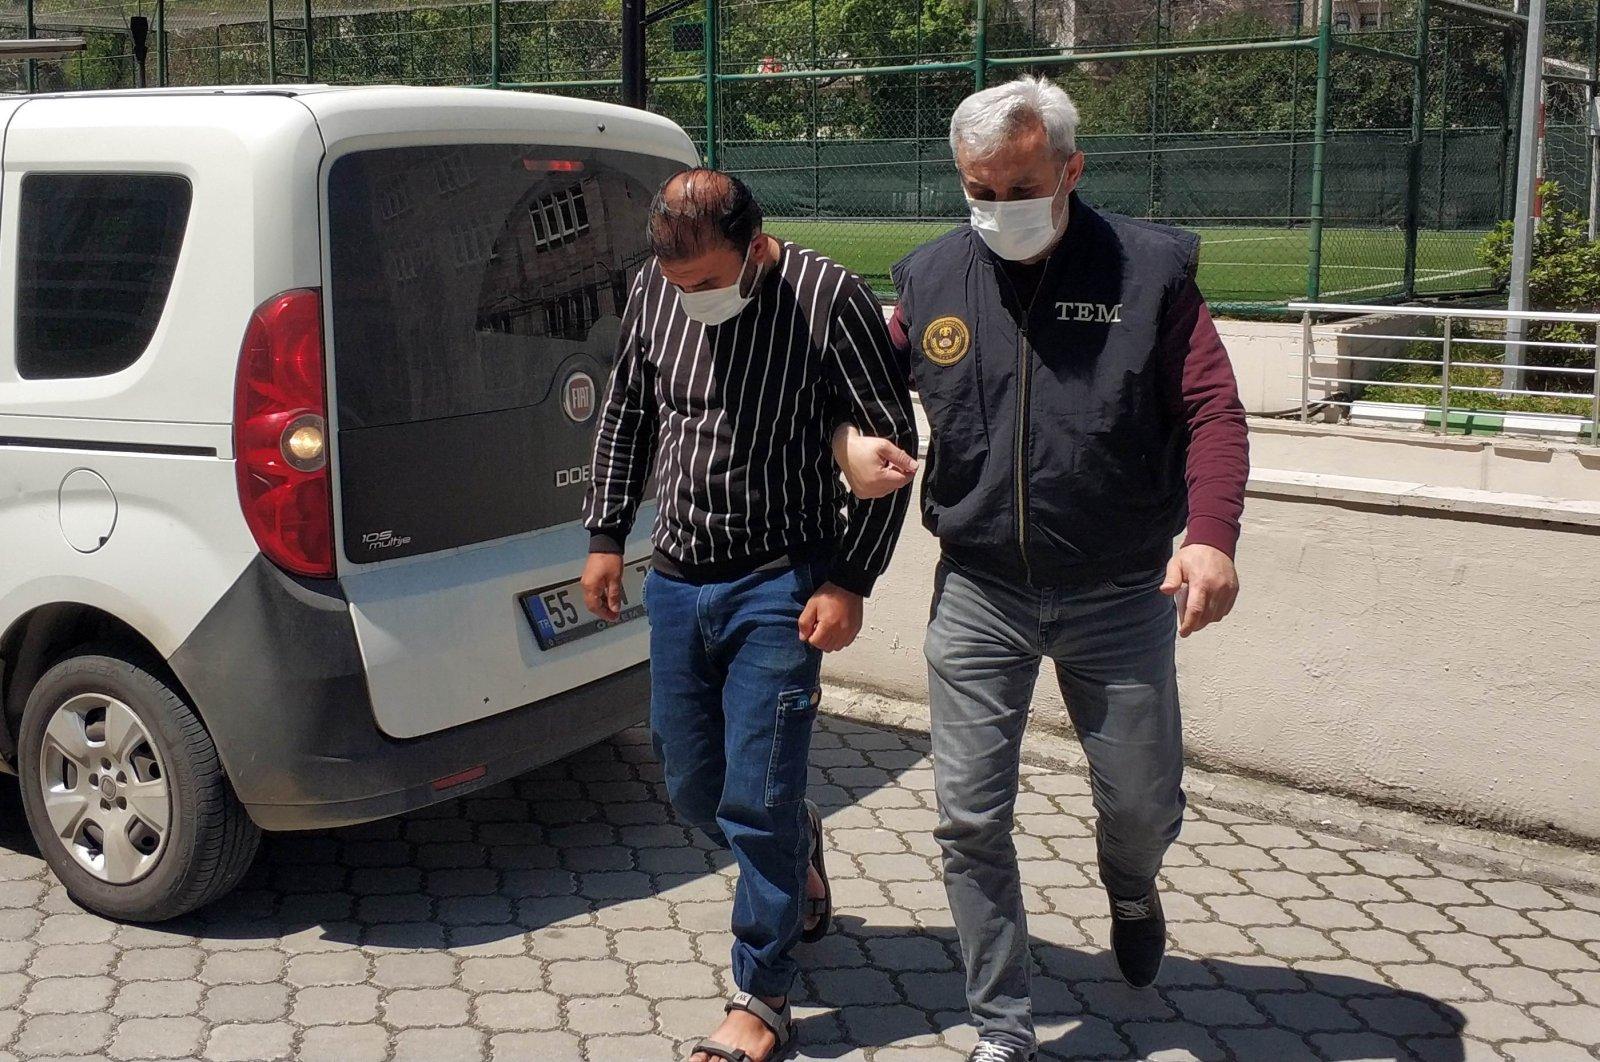 An Iraqi national (L) is taken into police custody under suspicion of having links to the Daesh terror group, northern Samsun province, Turkey, May 7, 2021. (IHA Photo)